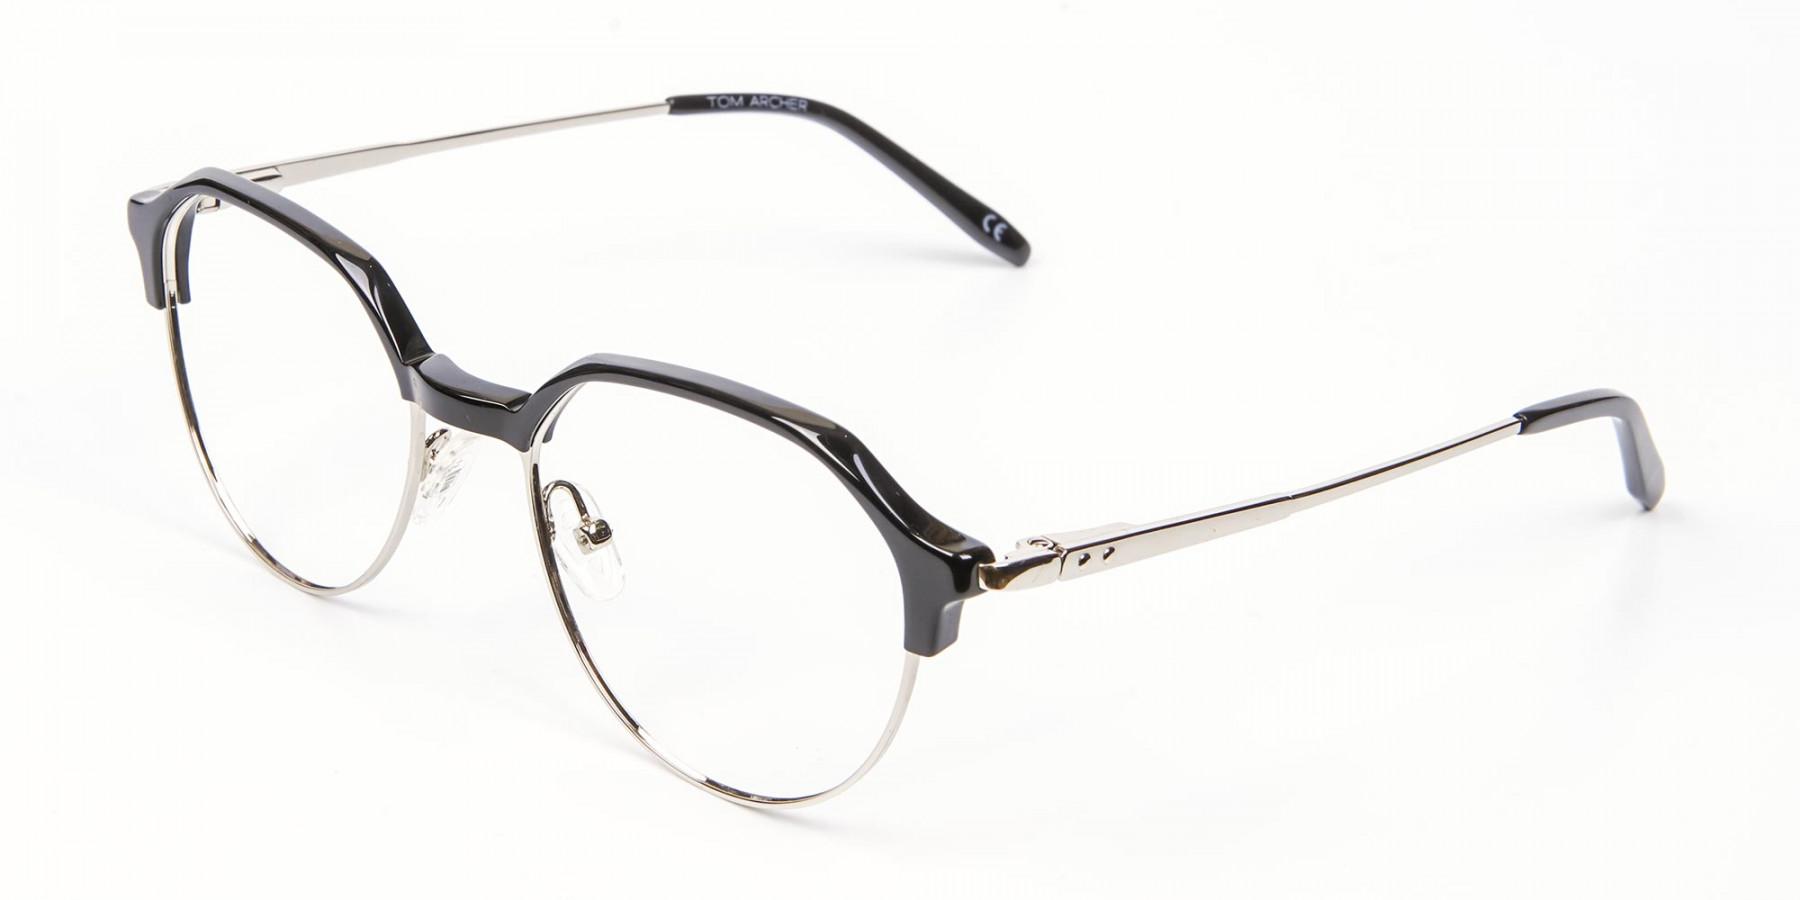 Unusual Shaped Glasses Black & Silver  - 1